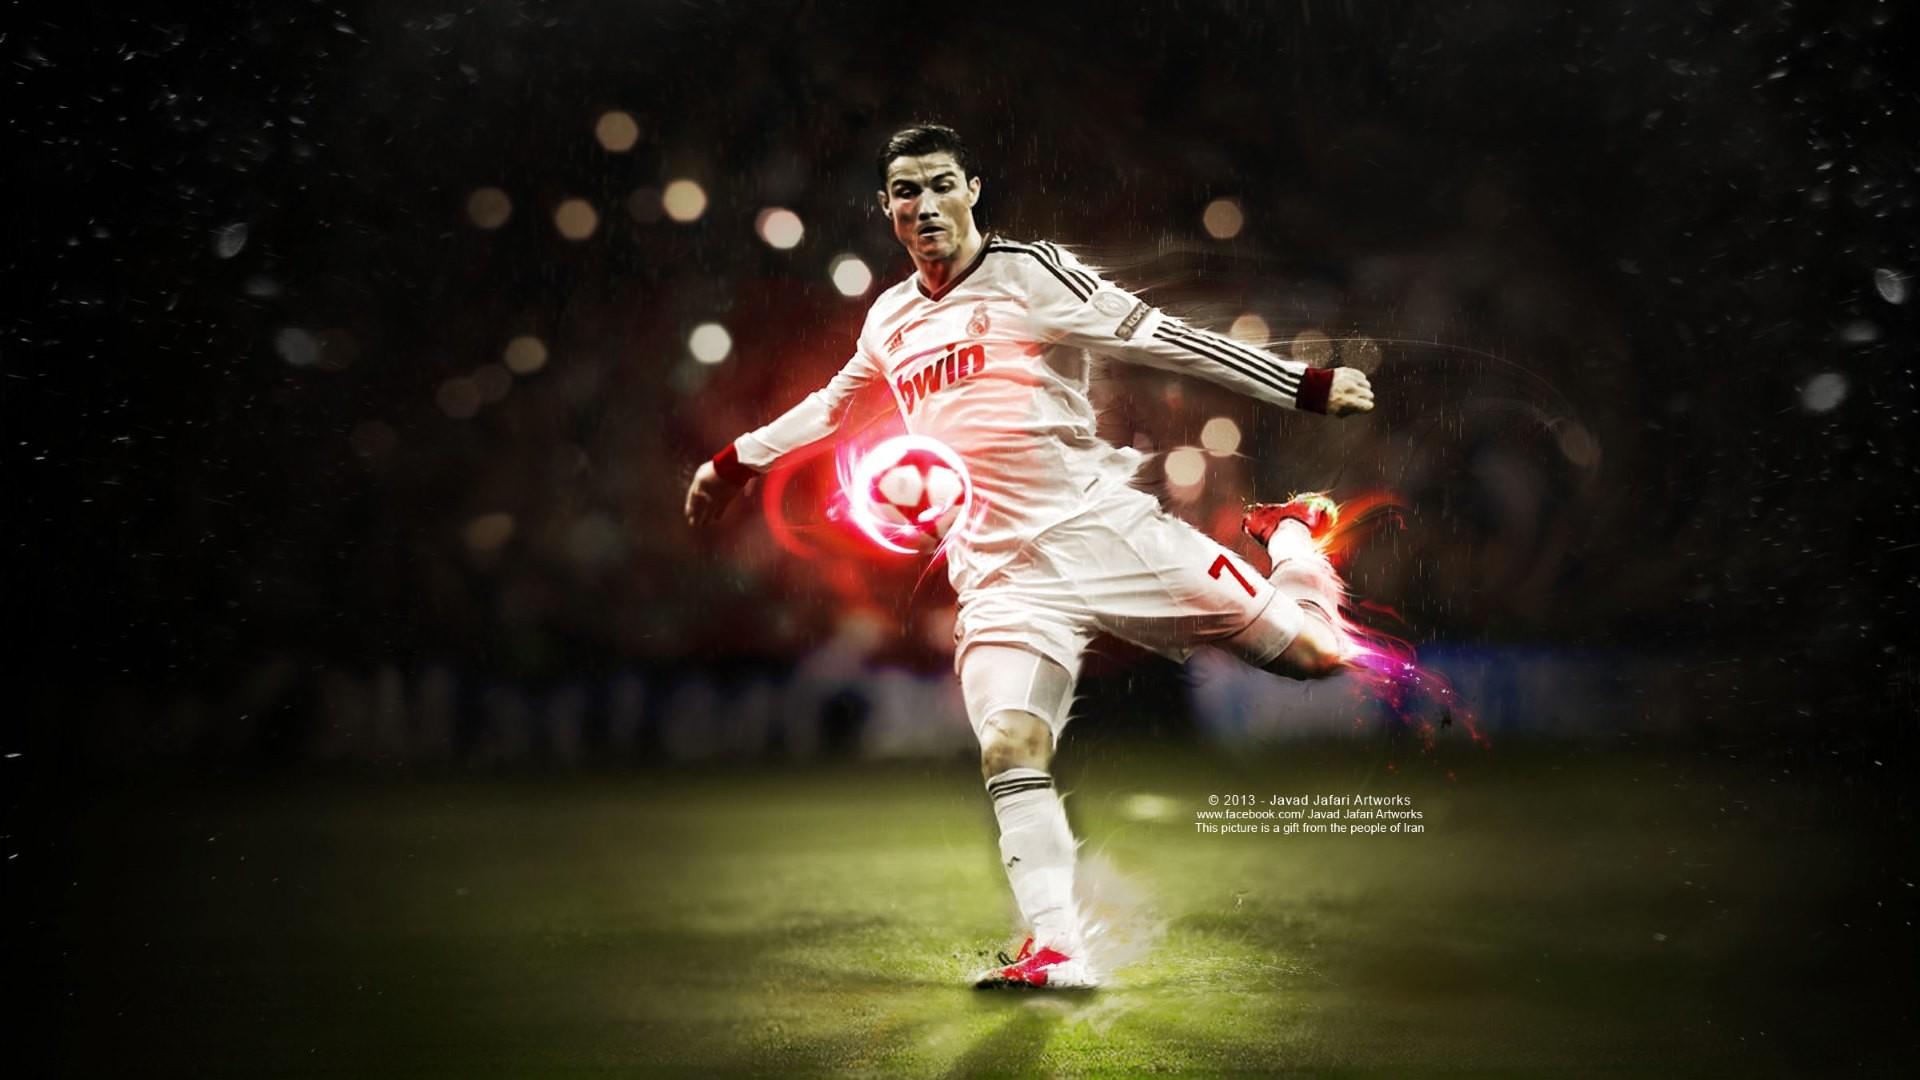 Cristiano Ronaldo Wallpapers 2016-2017 in HD | Soccer | Football